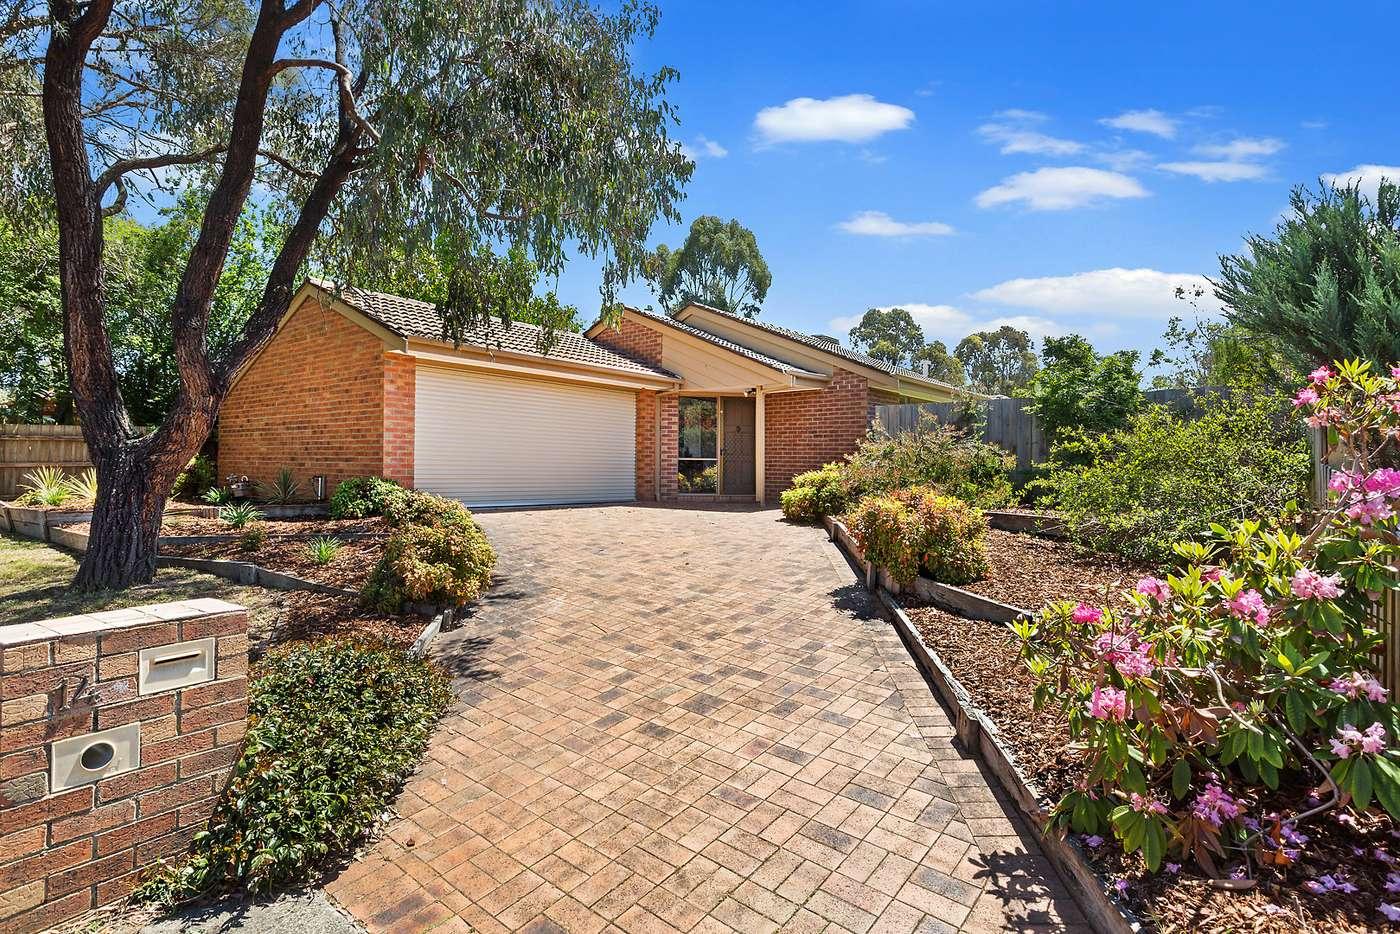 Main view of Homely house listing, 14 Wildwood Walk, Croydon South VIC 3136